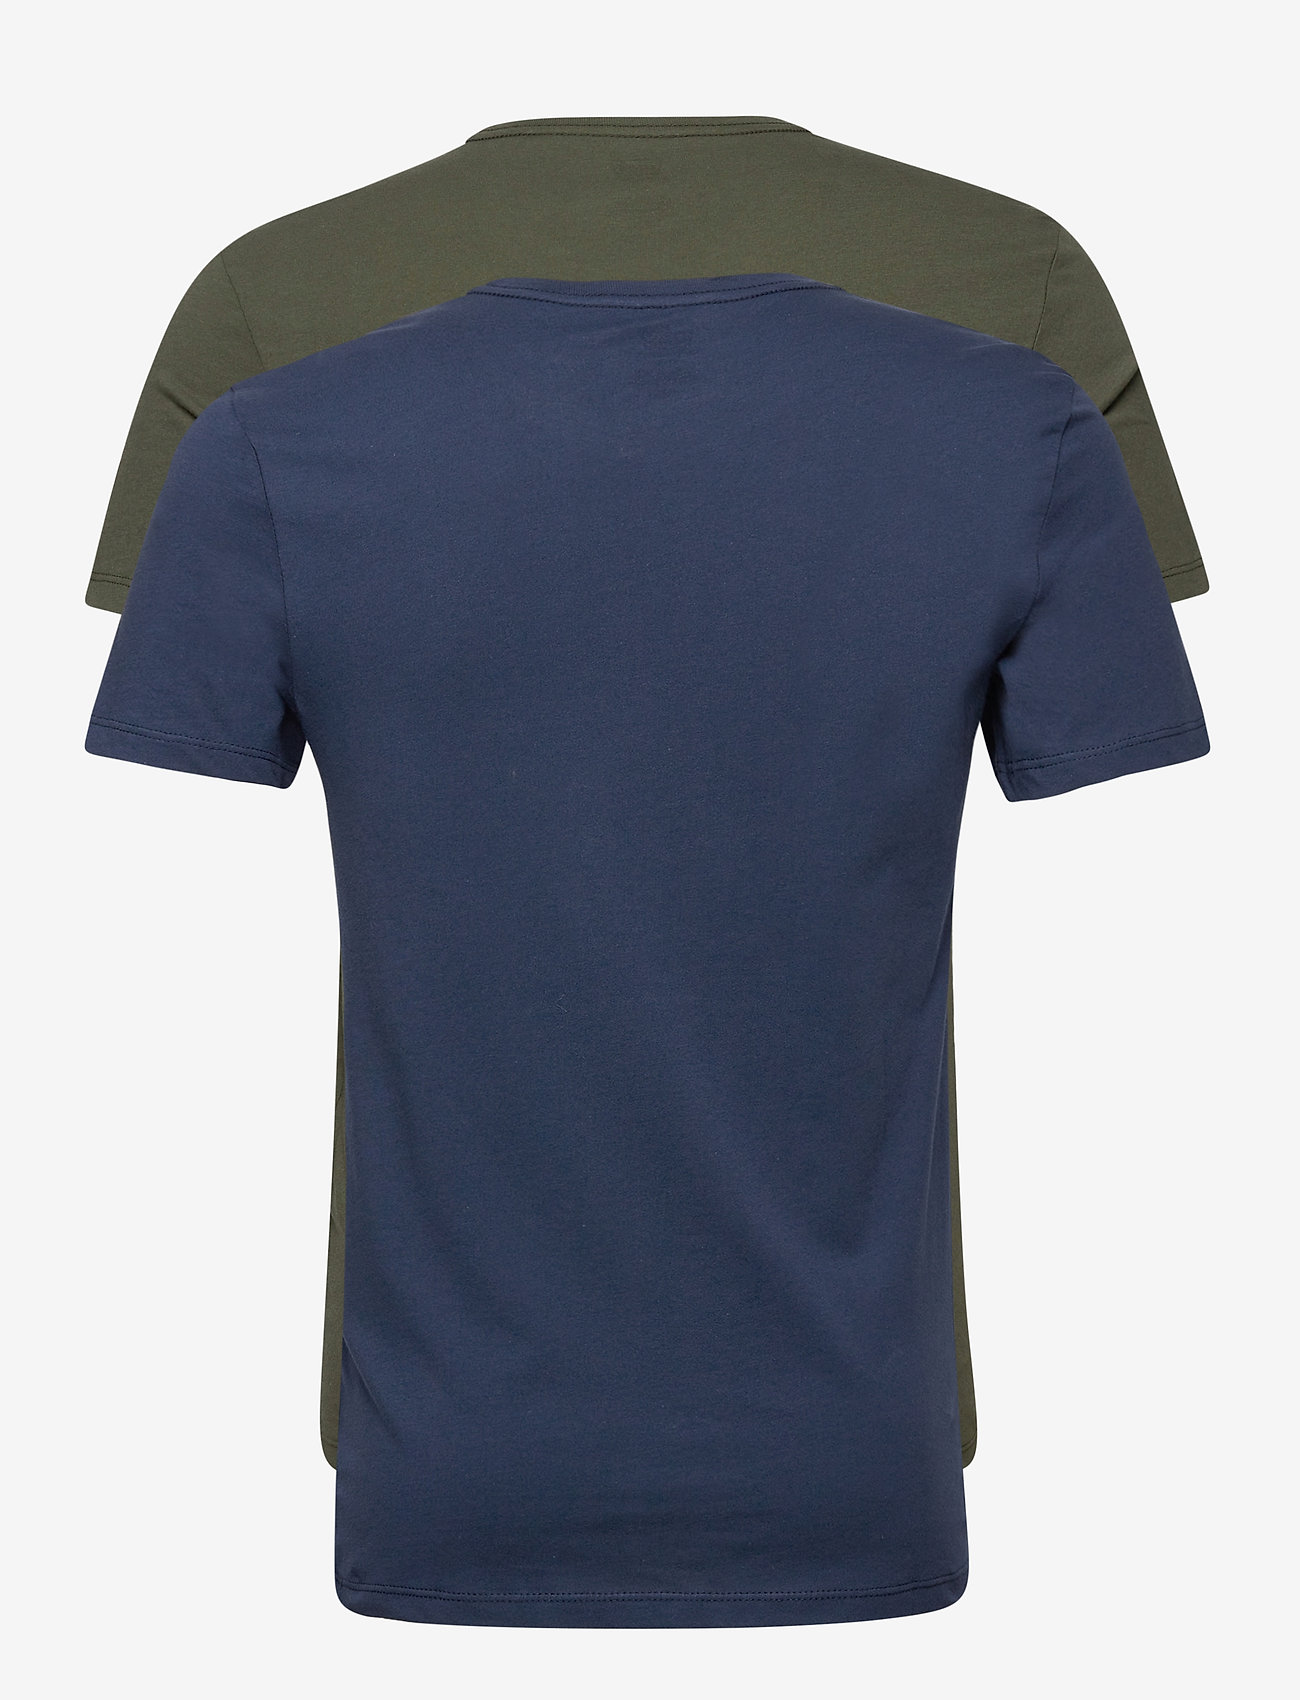 LEVI´S Men - SLIM 2PK CREWNECK 1 2PK SLIM C - podstawowe koszulki - multi-color - 1